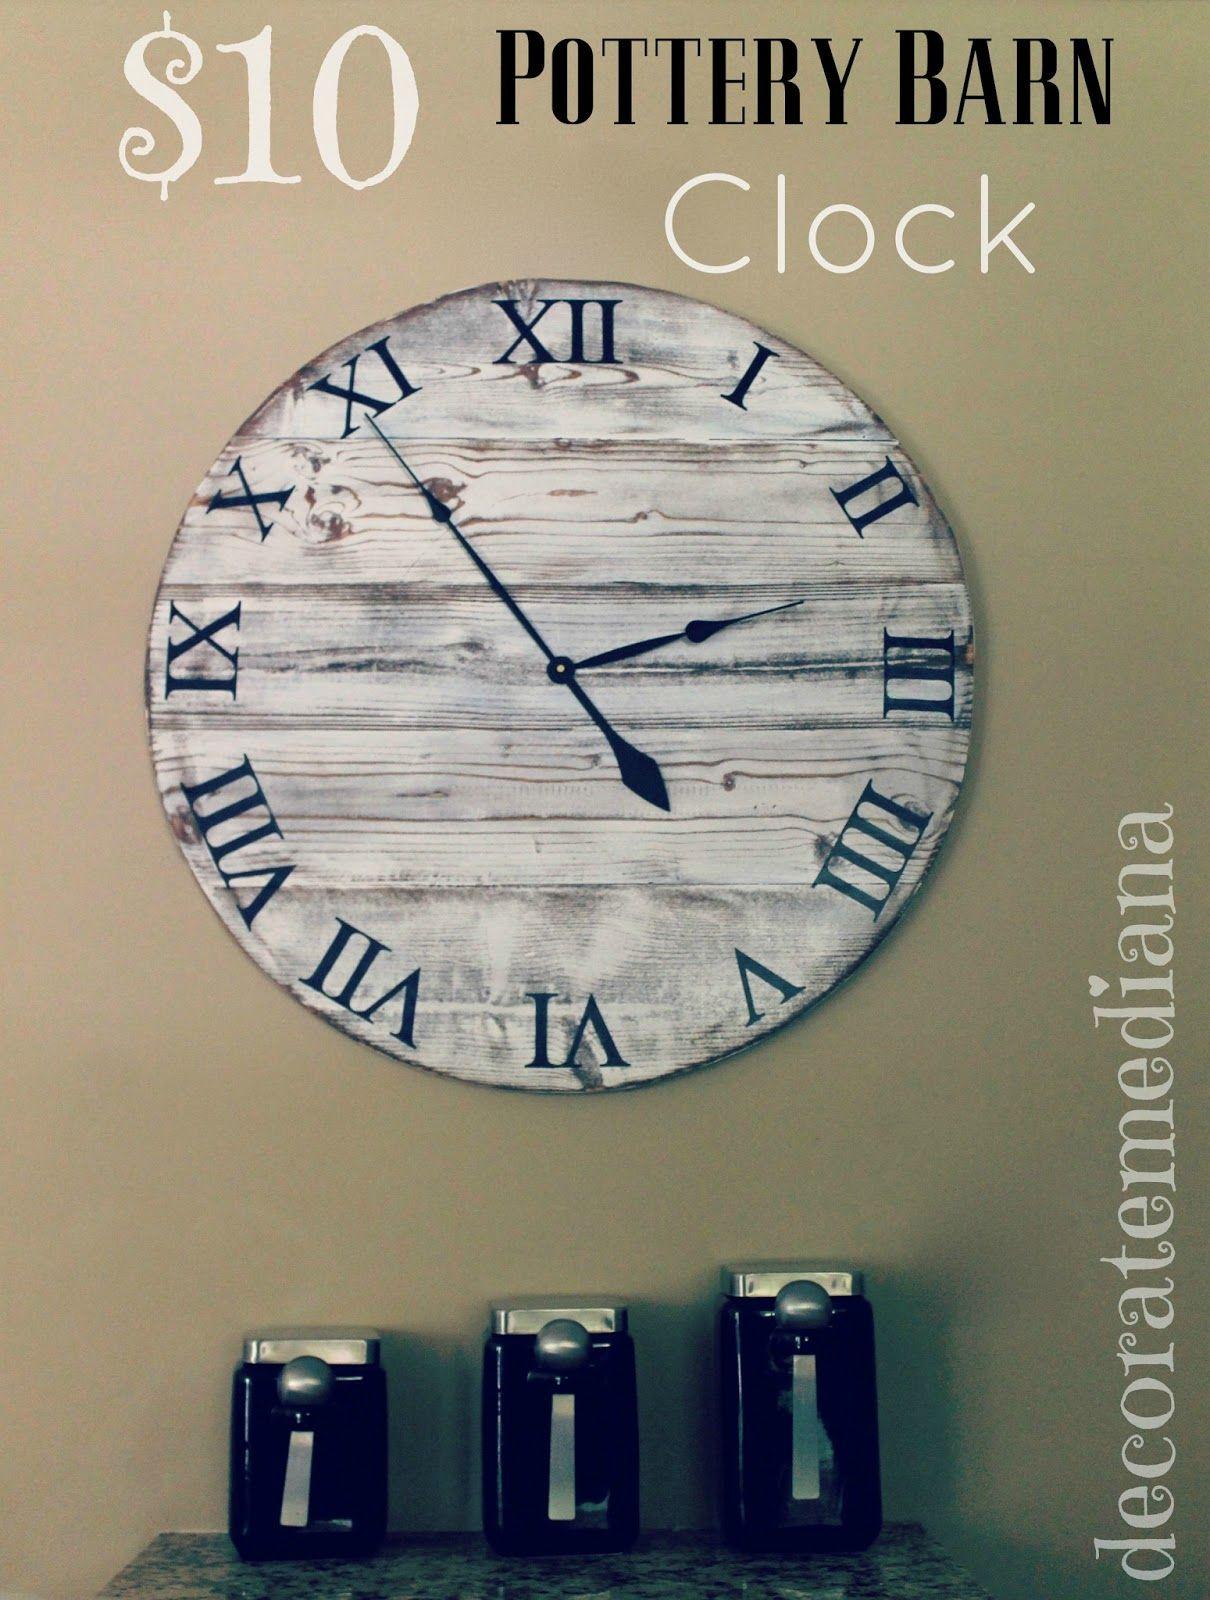 Down Oxford Street Pottery Barn Knock Off Clock